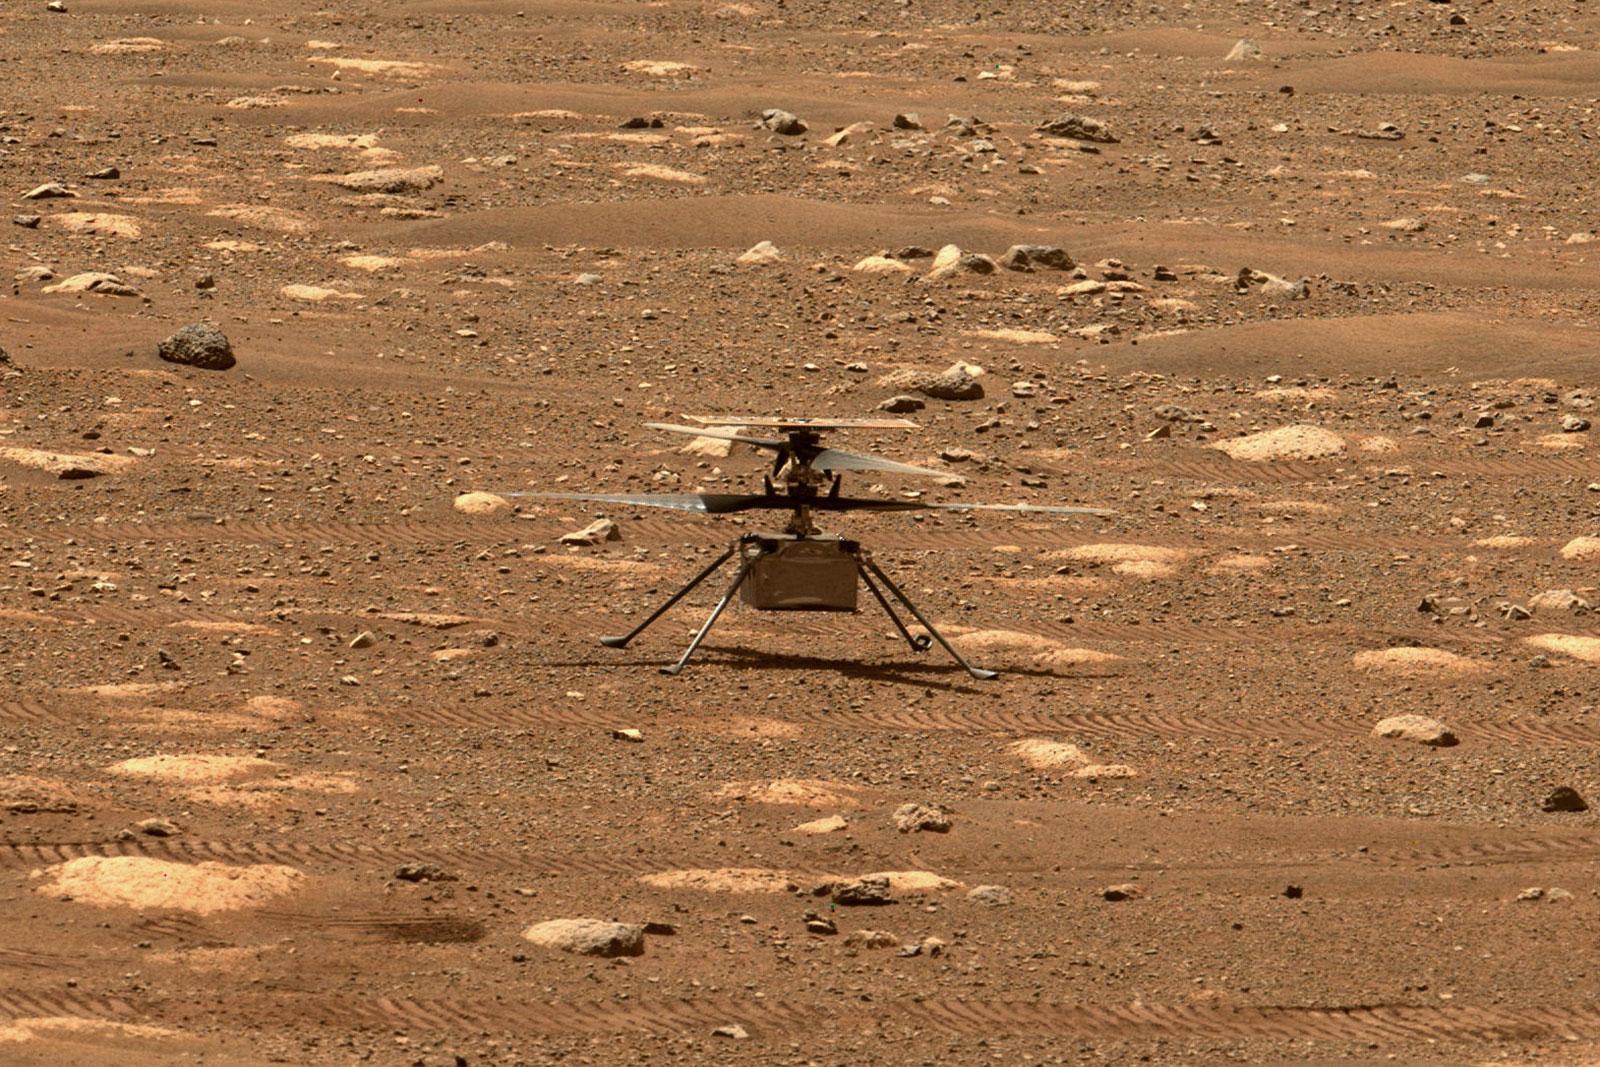 NASA Ingenuity probe